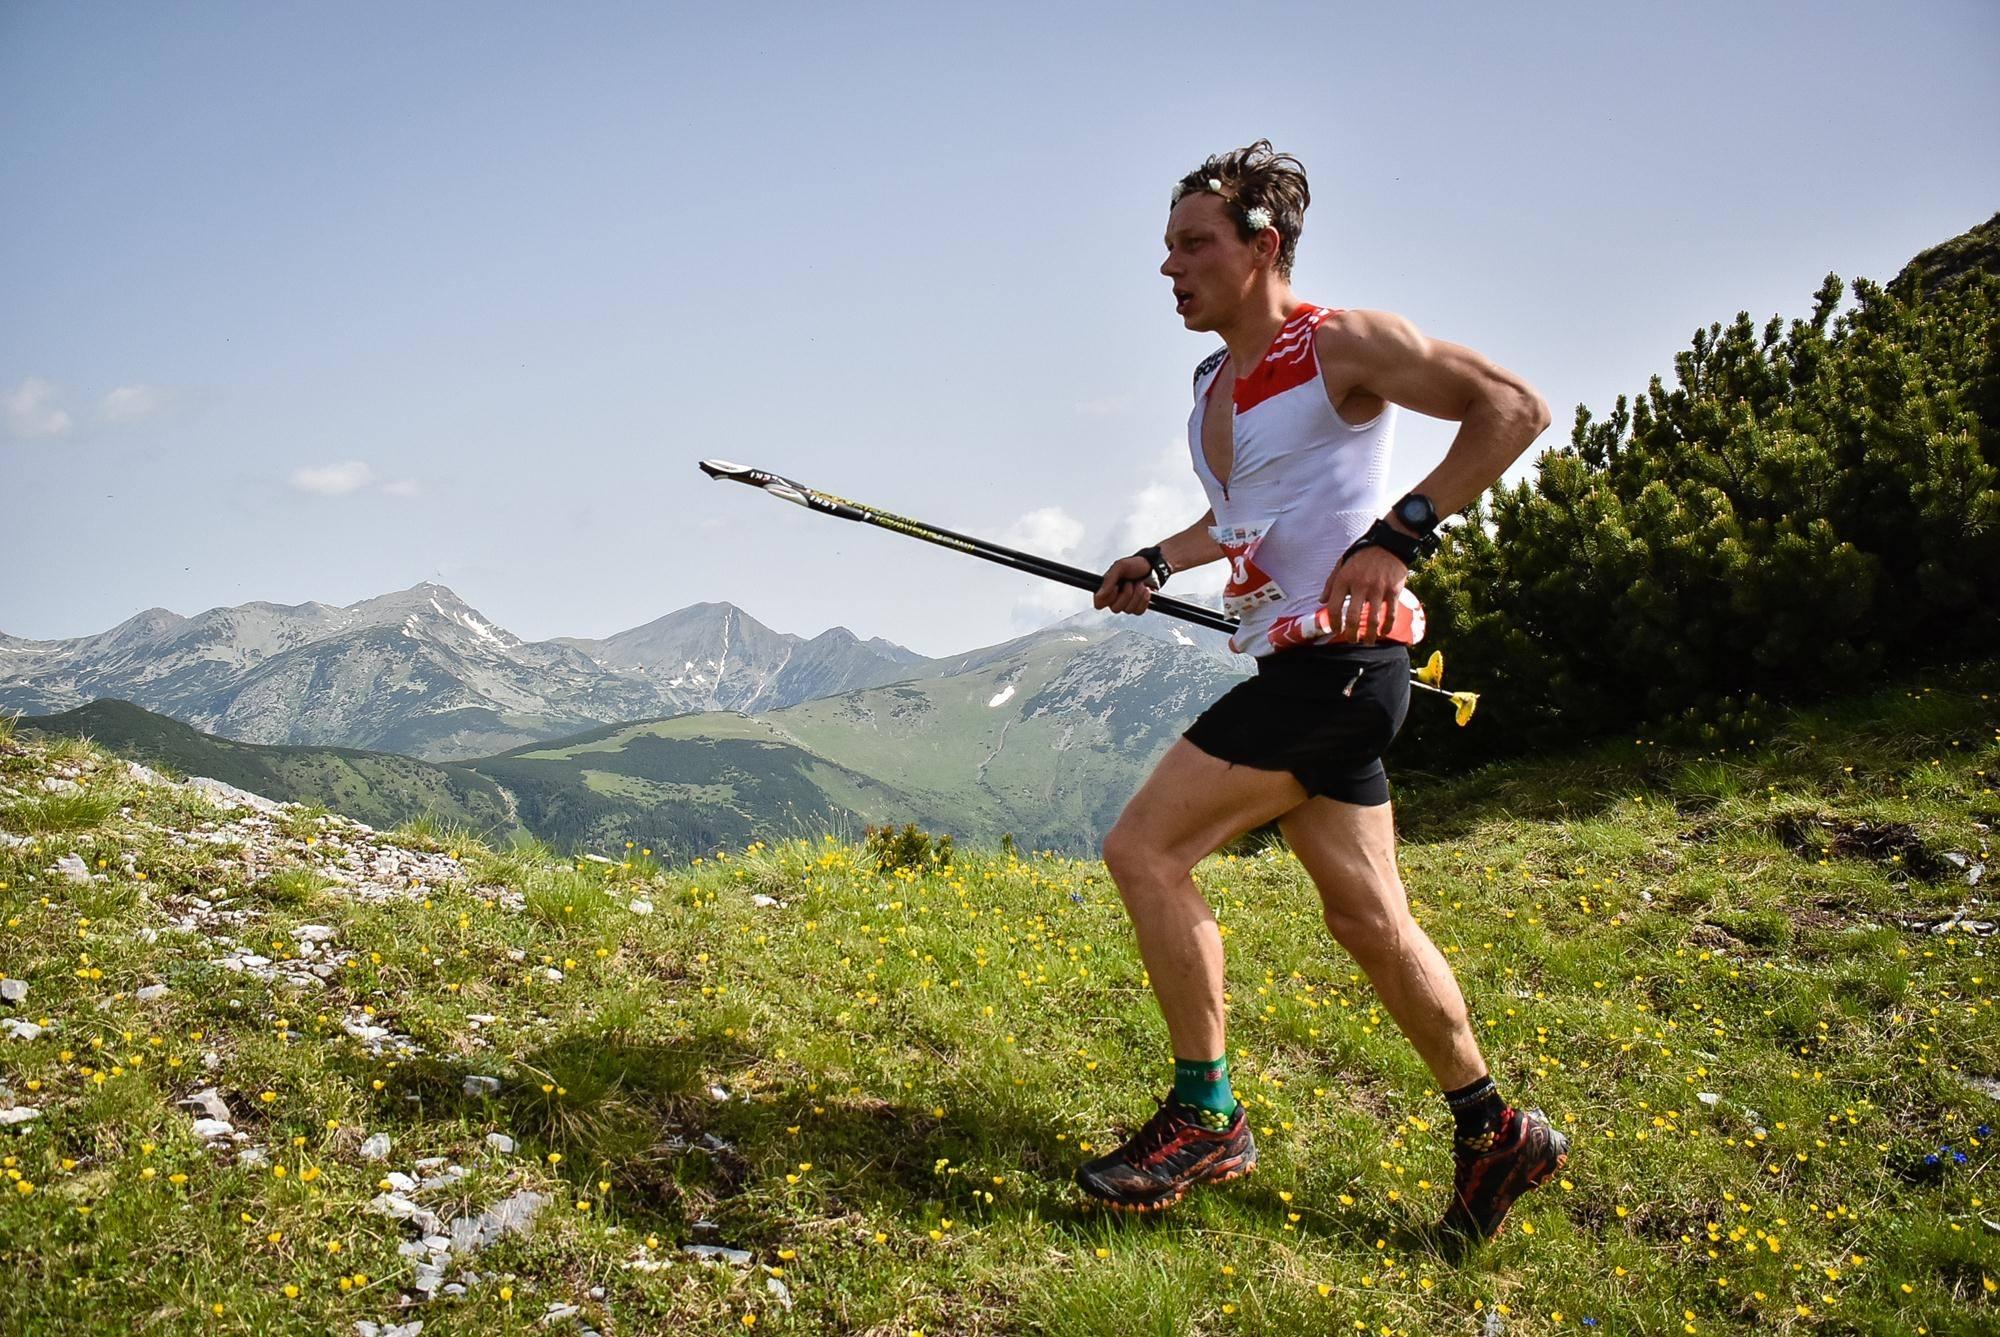 Interviu cu Robert Hajnal, ultramaratonist